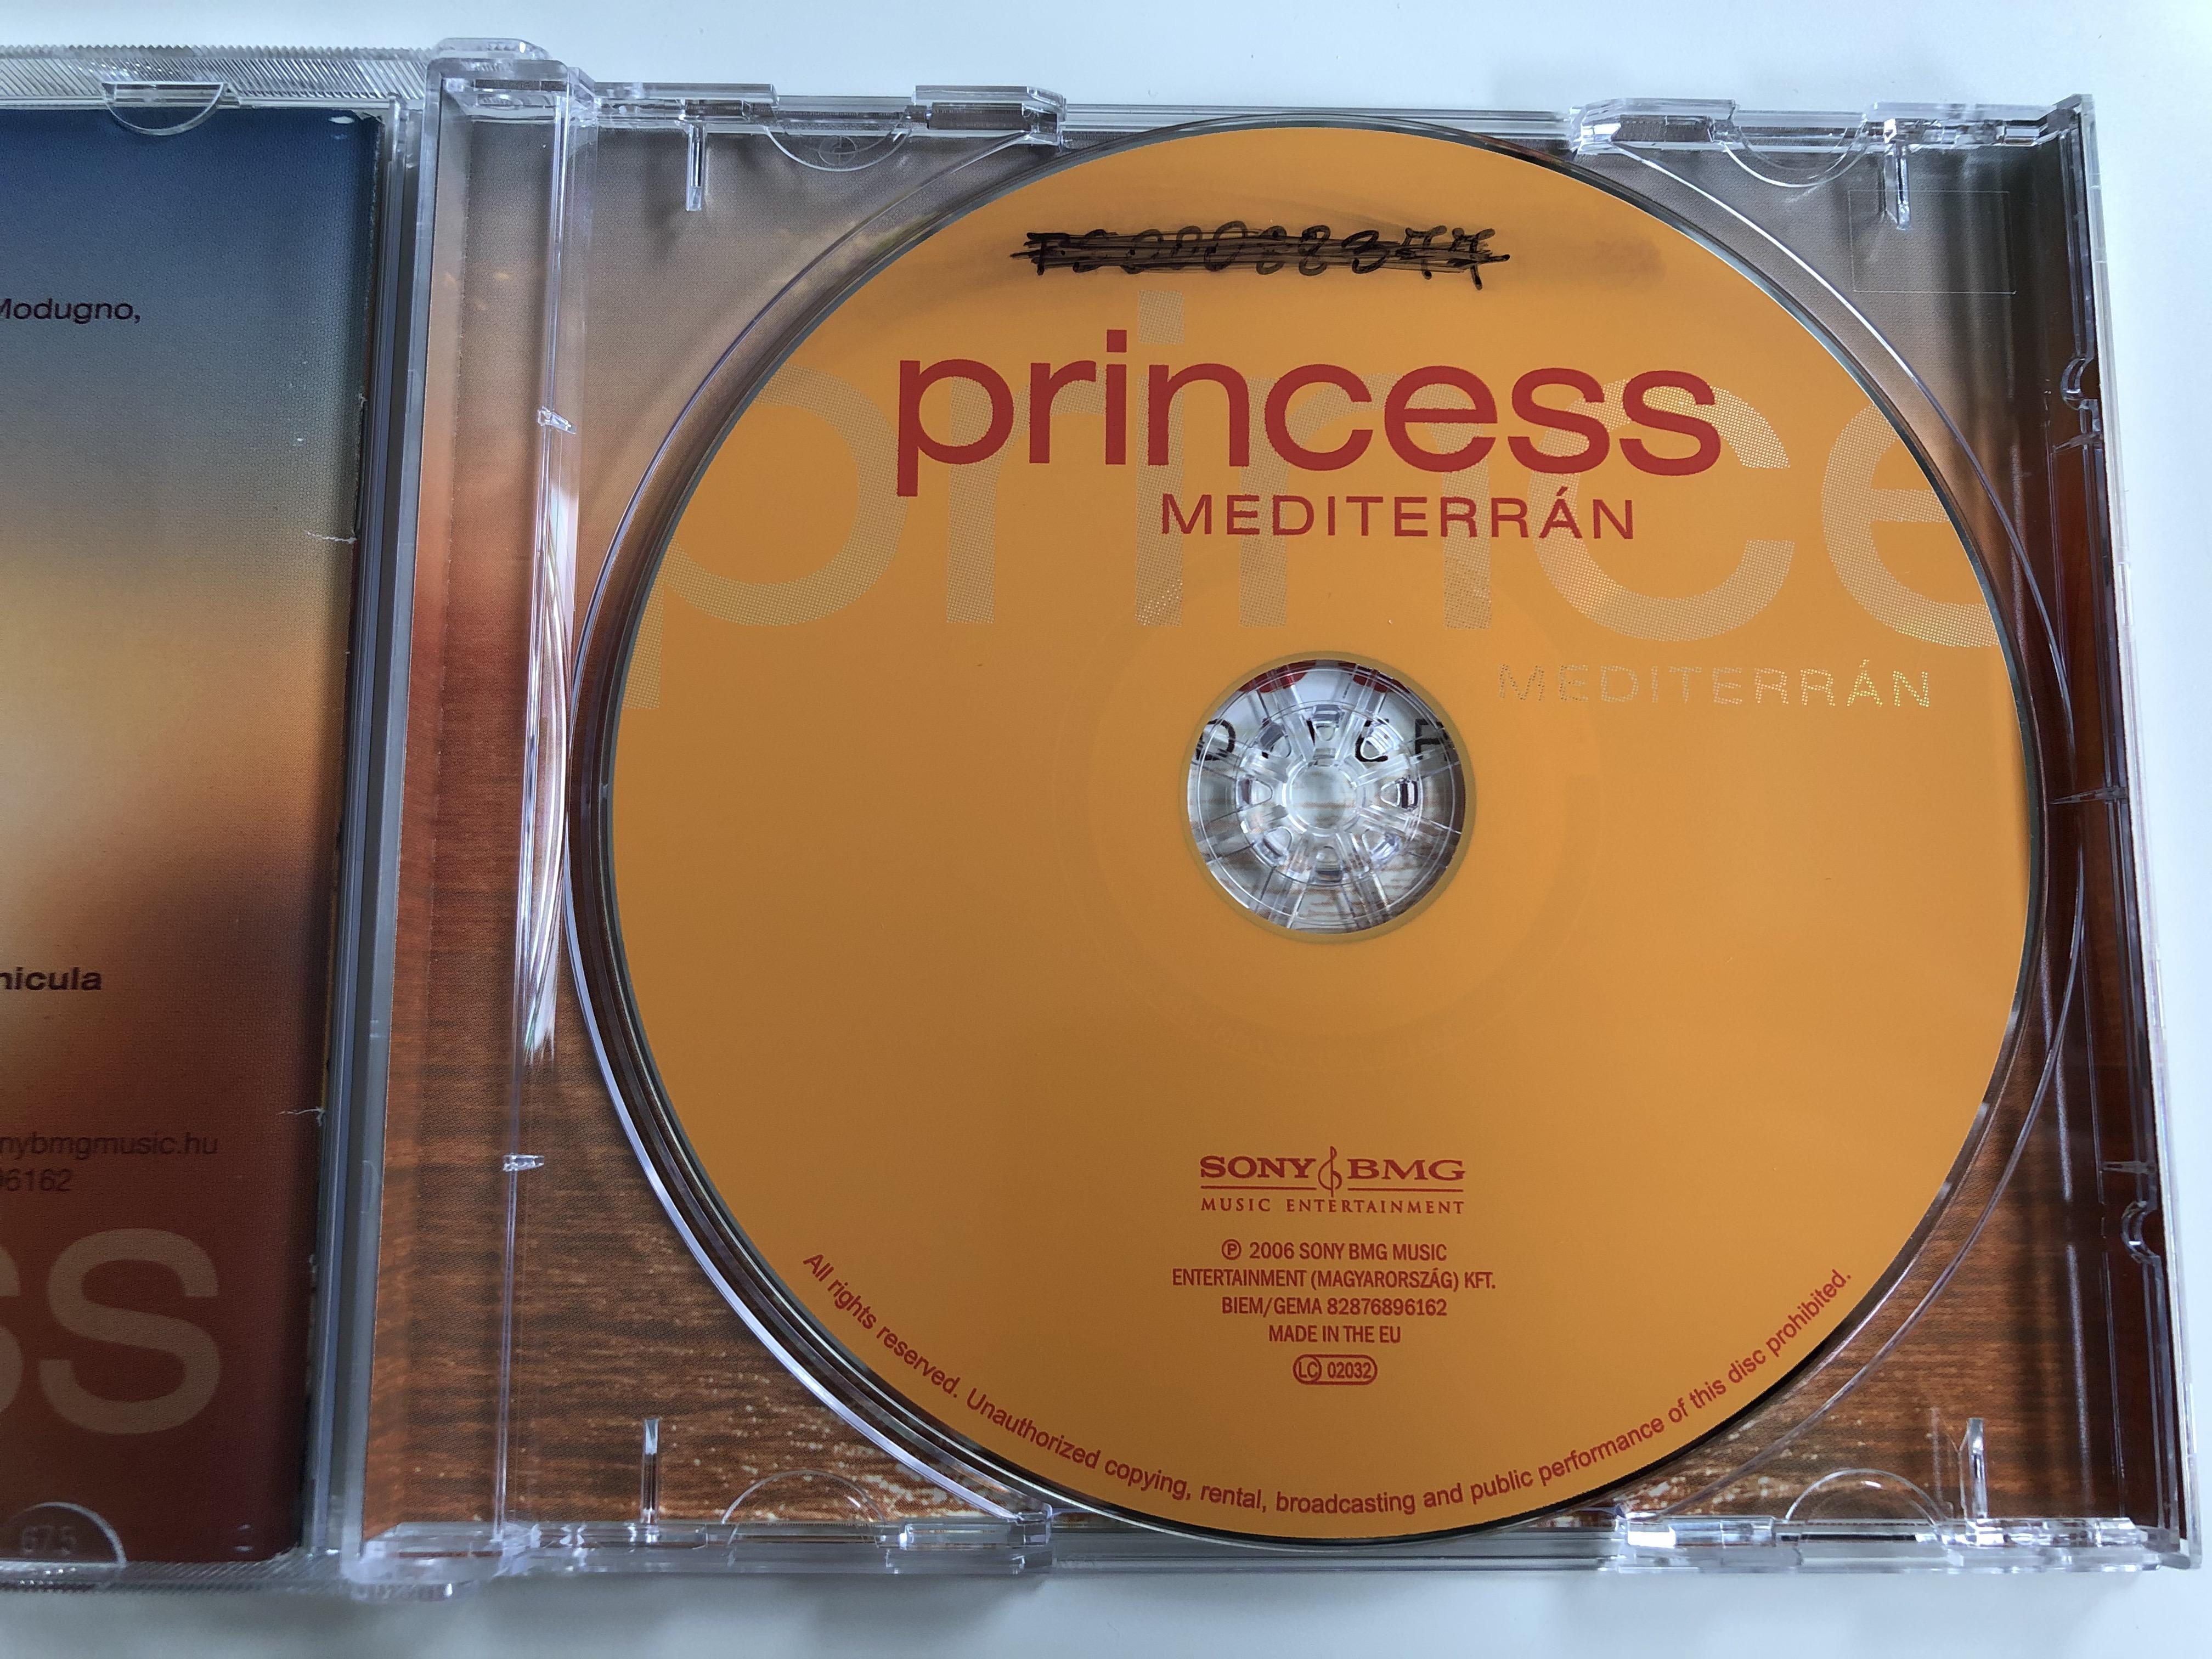 princess-mediterr-n-sony-bmg-music-entertainment-audio-cd-2006-82876896162-8-.jpg